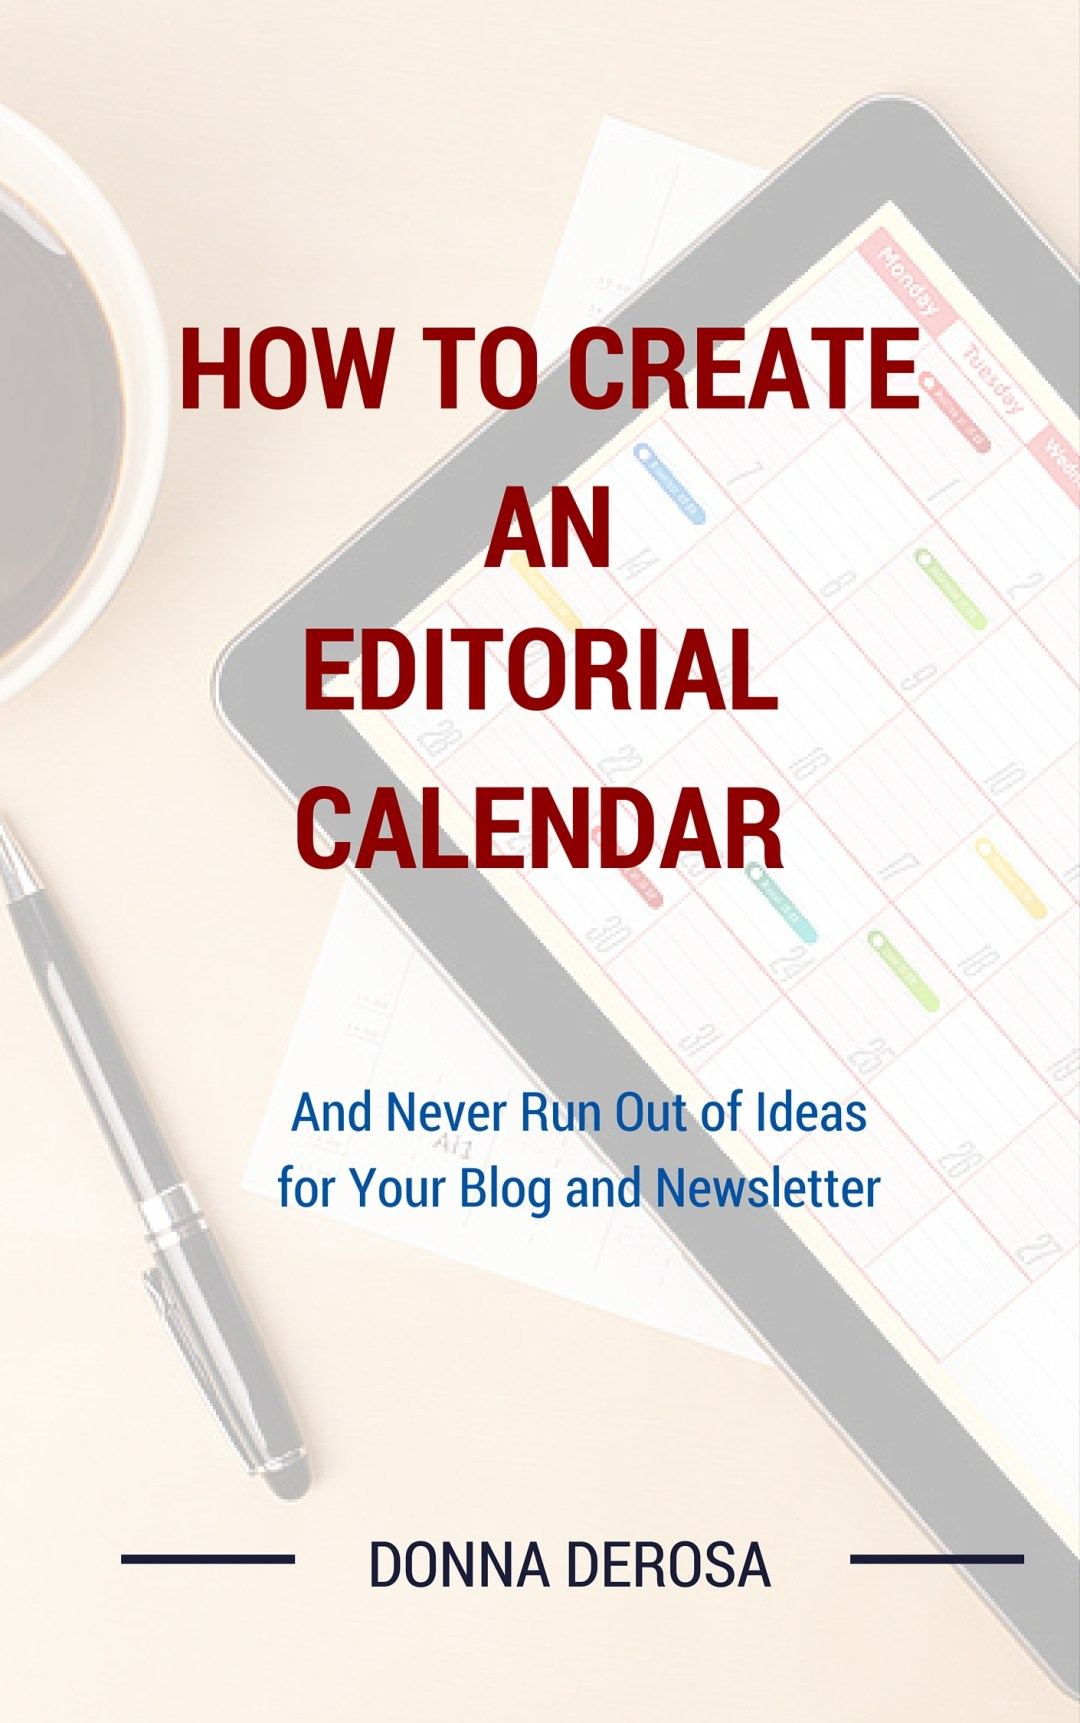 How To Create an Editorial Calendar by Donna DeRosa